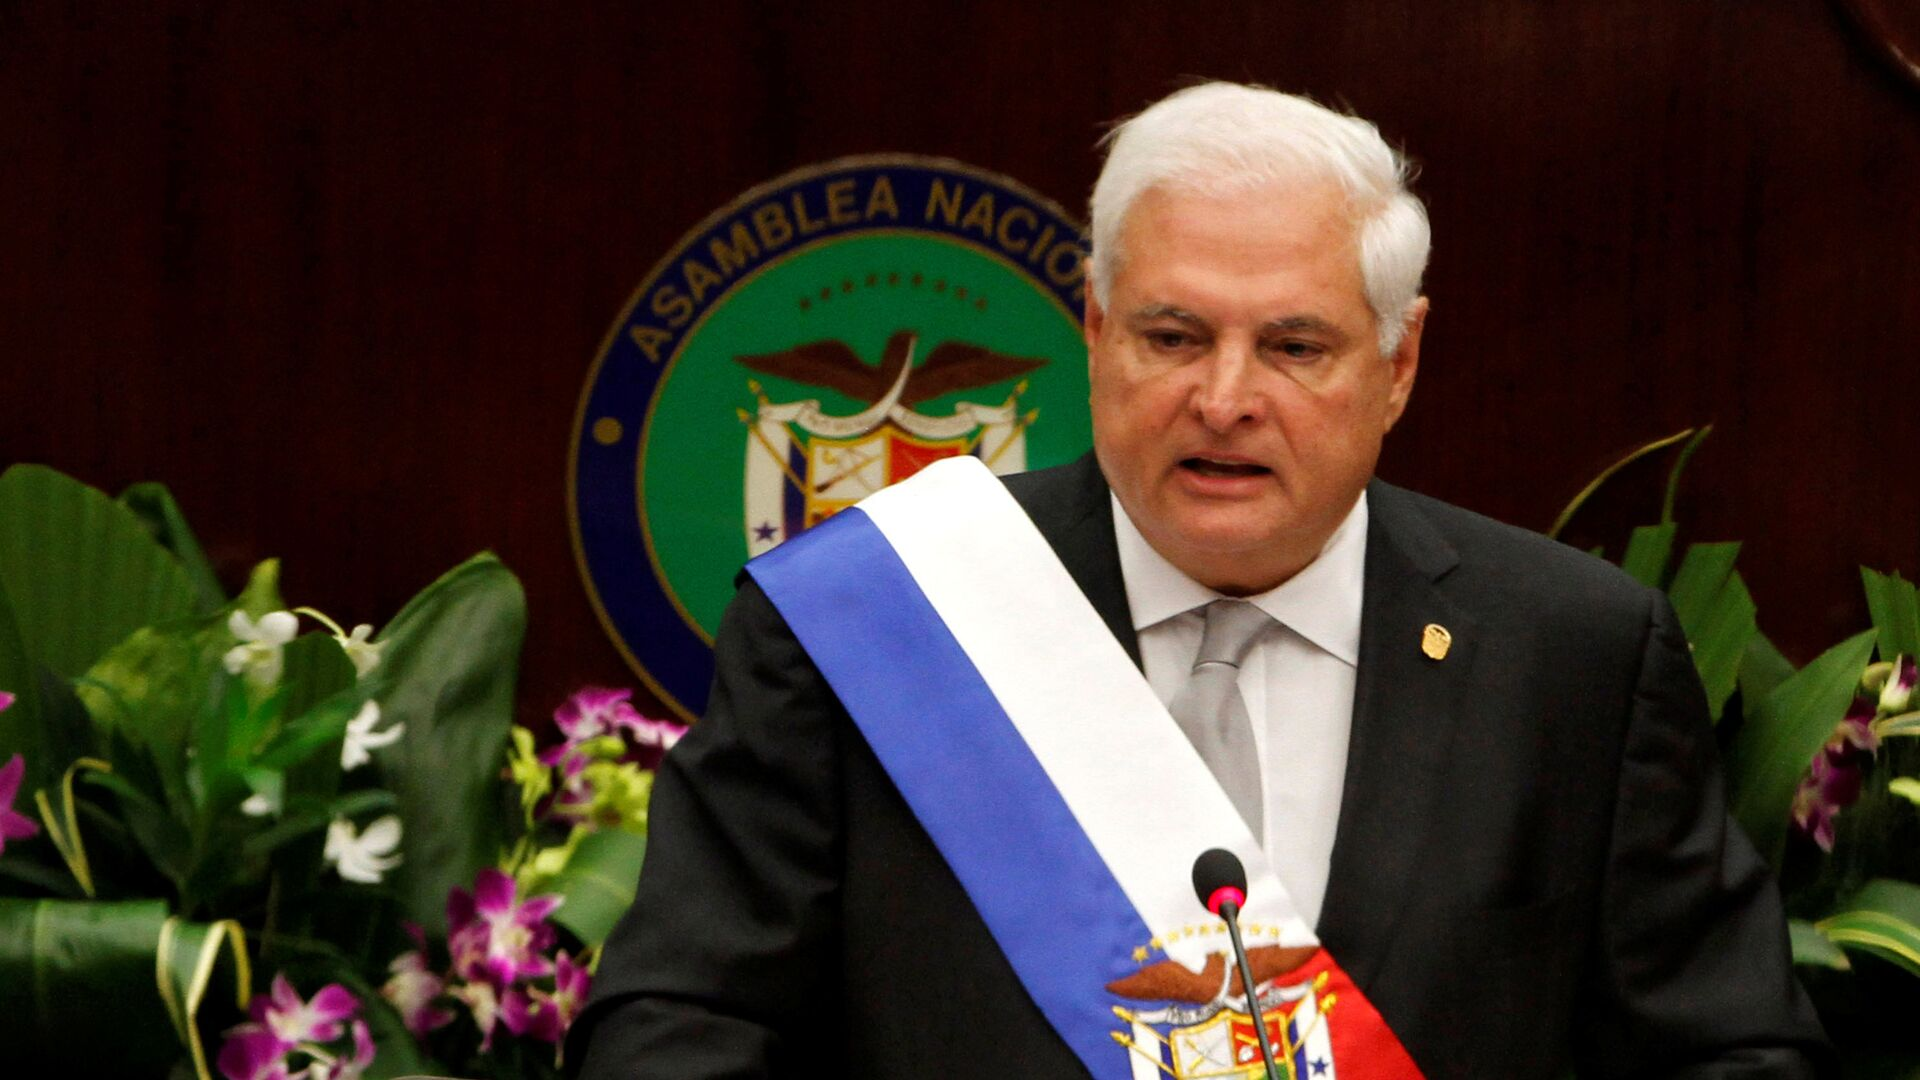 Ricardo Martinelli, expresidente de Panamá - Sputnik Mundo, 1920, 26.05.2021